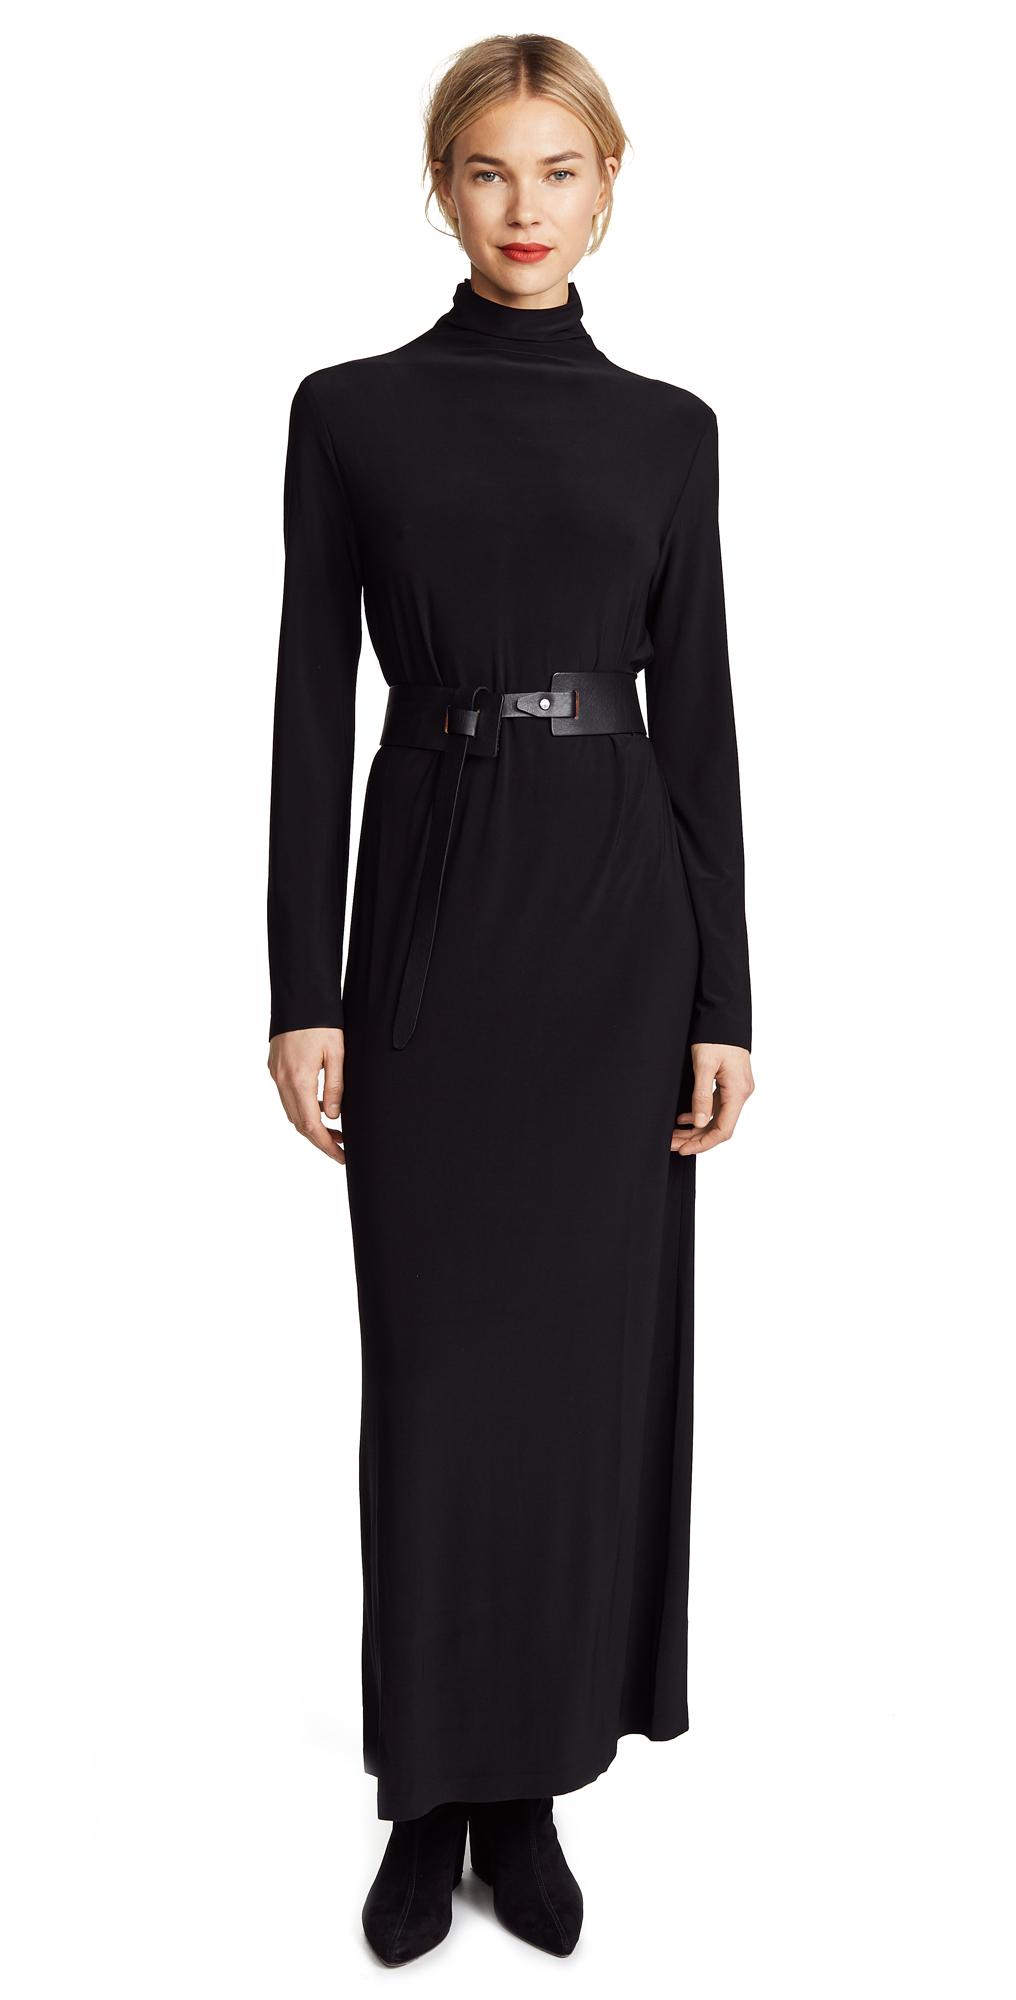 Norma Kamali Kamali Kulture Go Turtleneck Maxi Dress